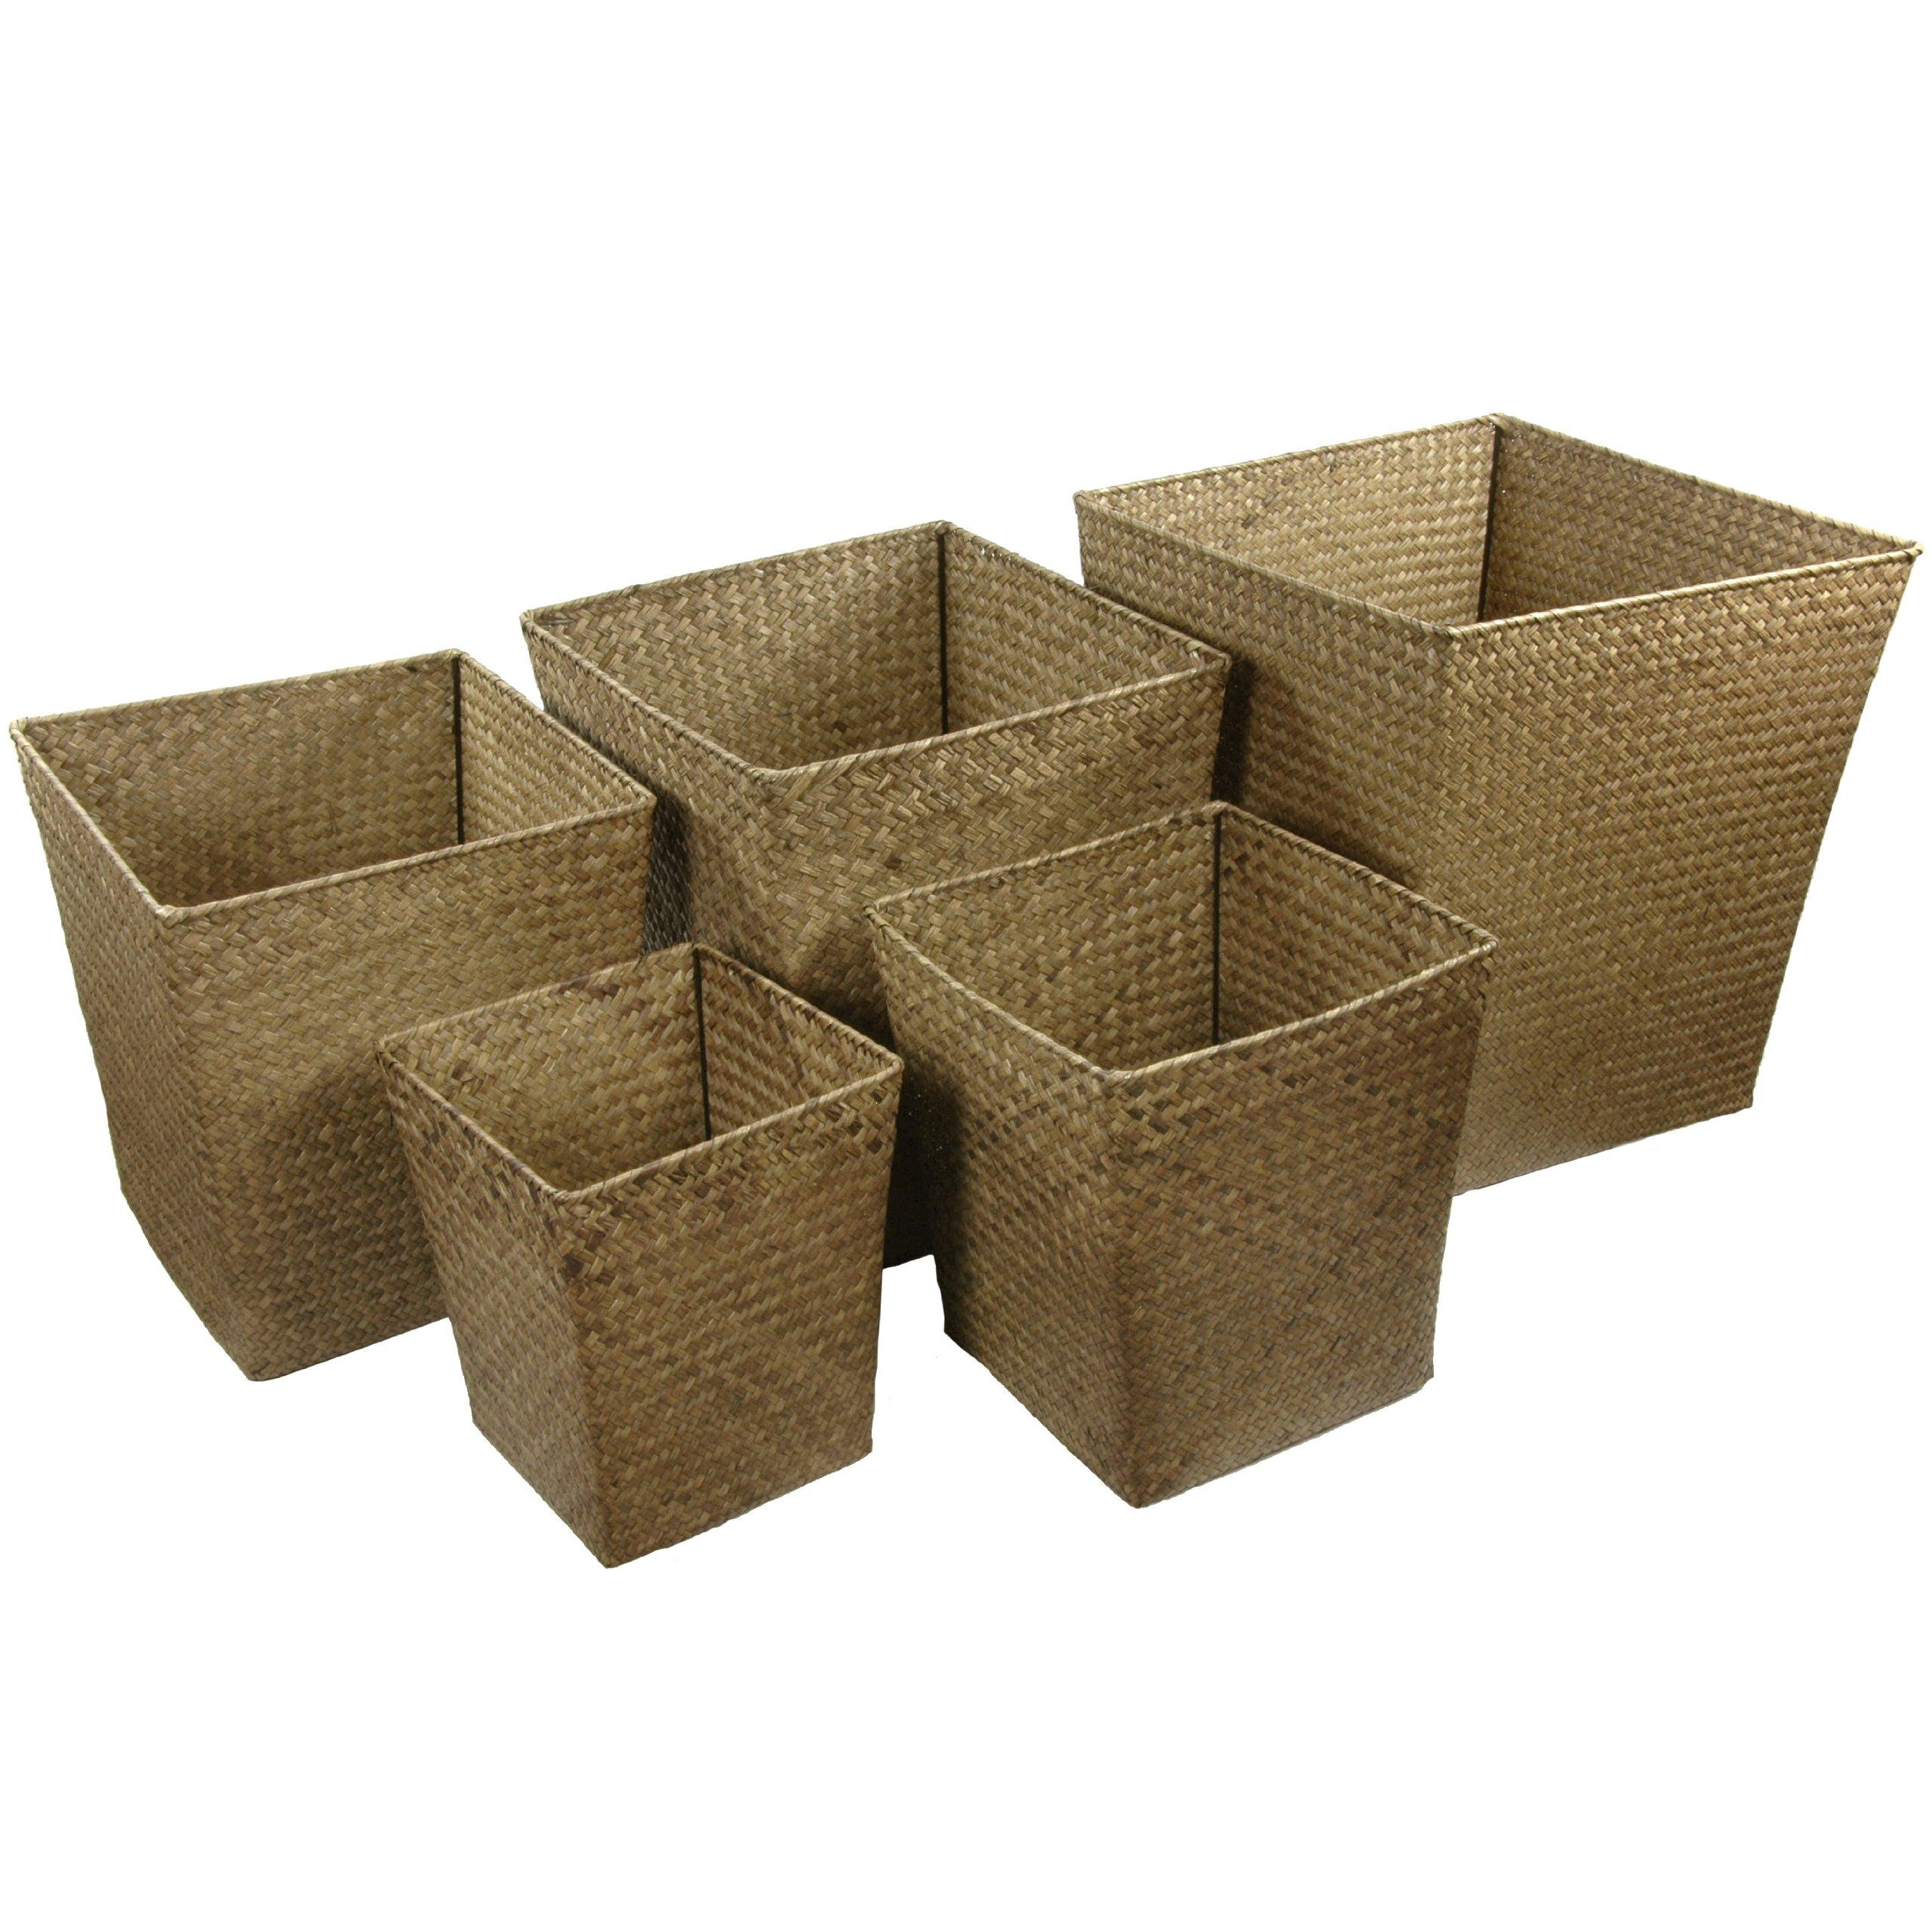 Oriental Furniture Hand Woven Natural Storage Bin ( Set of 5 )